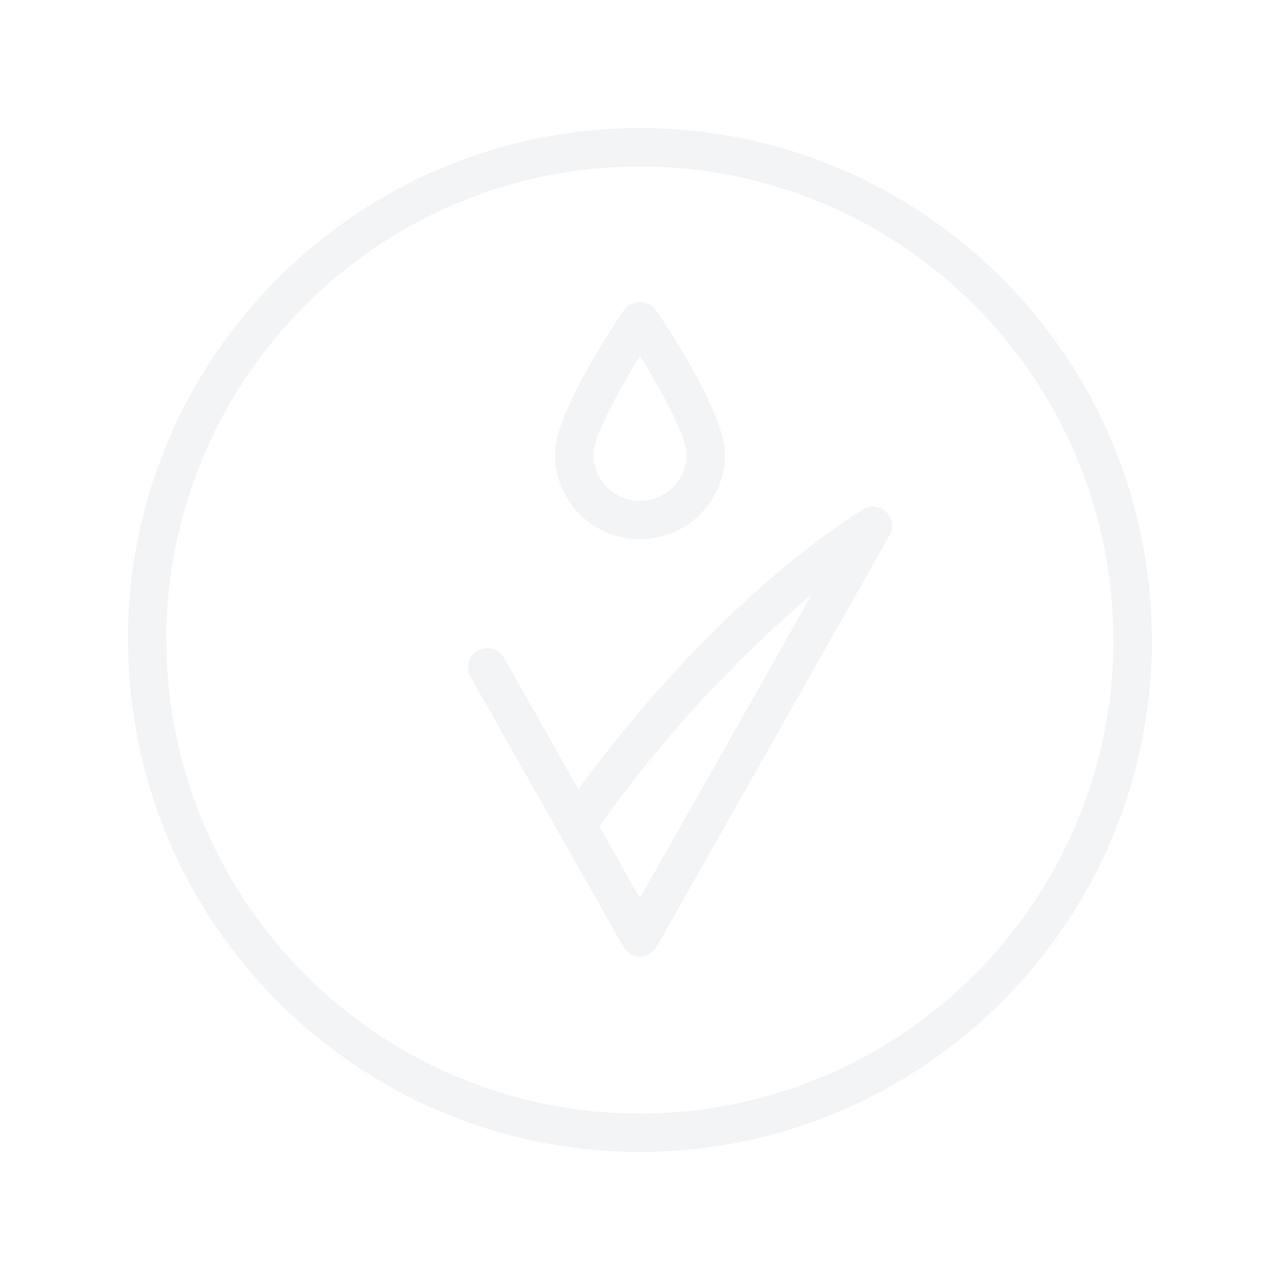 BOURJOIS Radiance Reveal Concealer 7.8ml